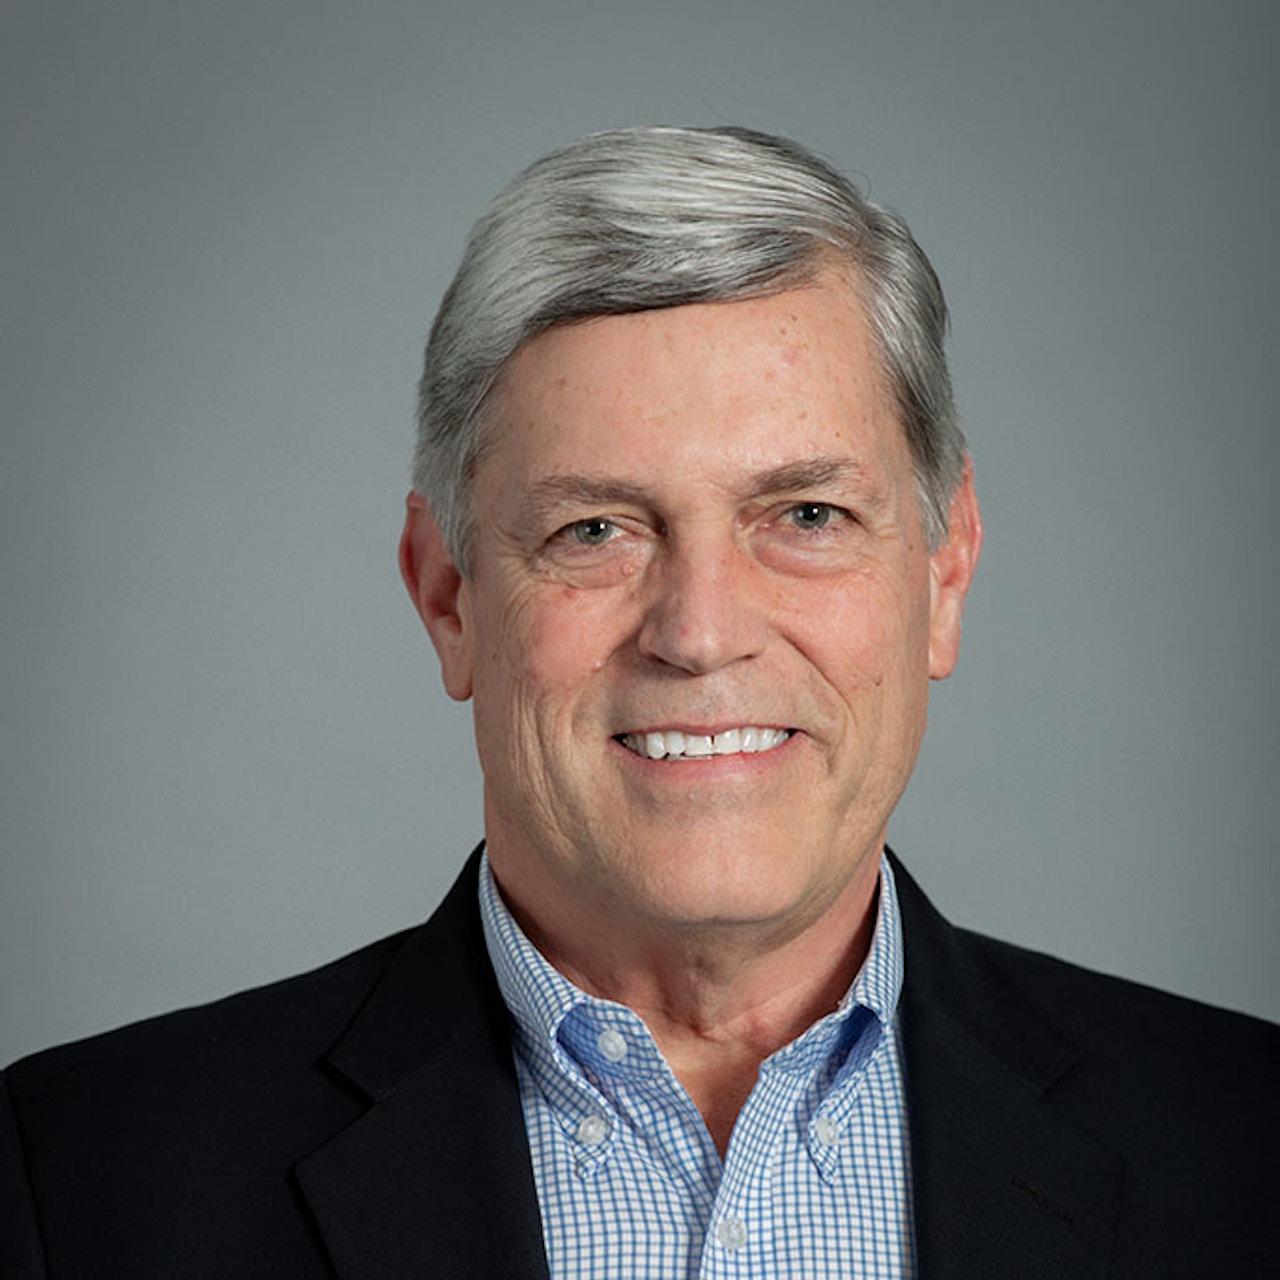 Tim Brasher - CFO of MW Industries